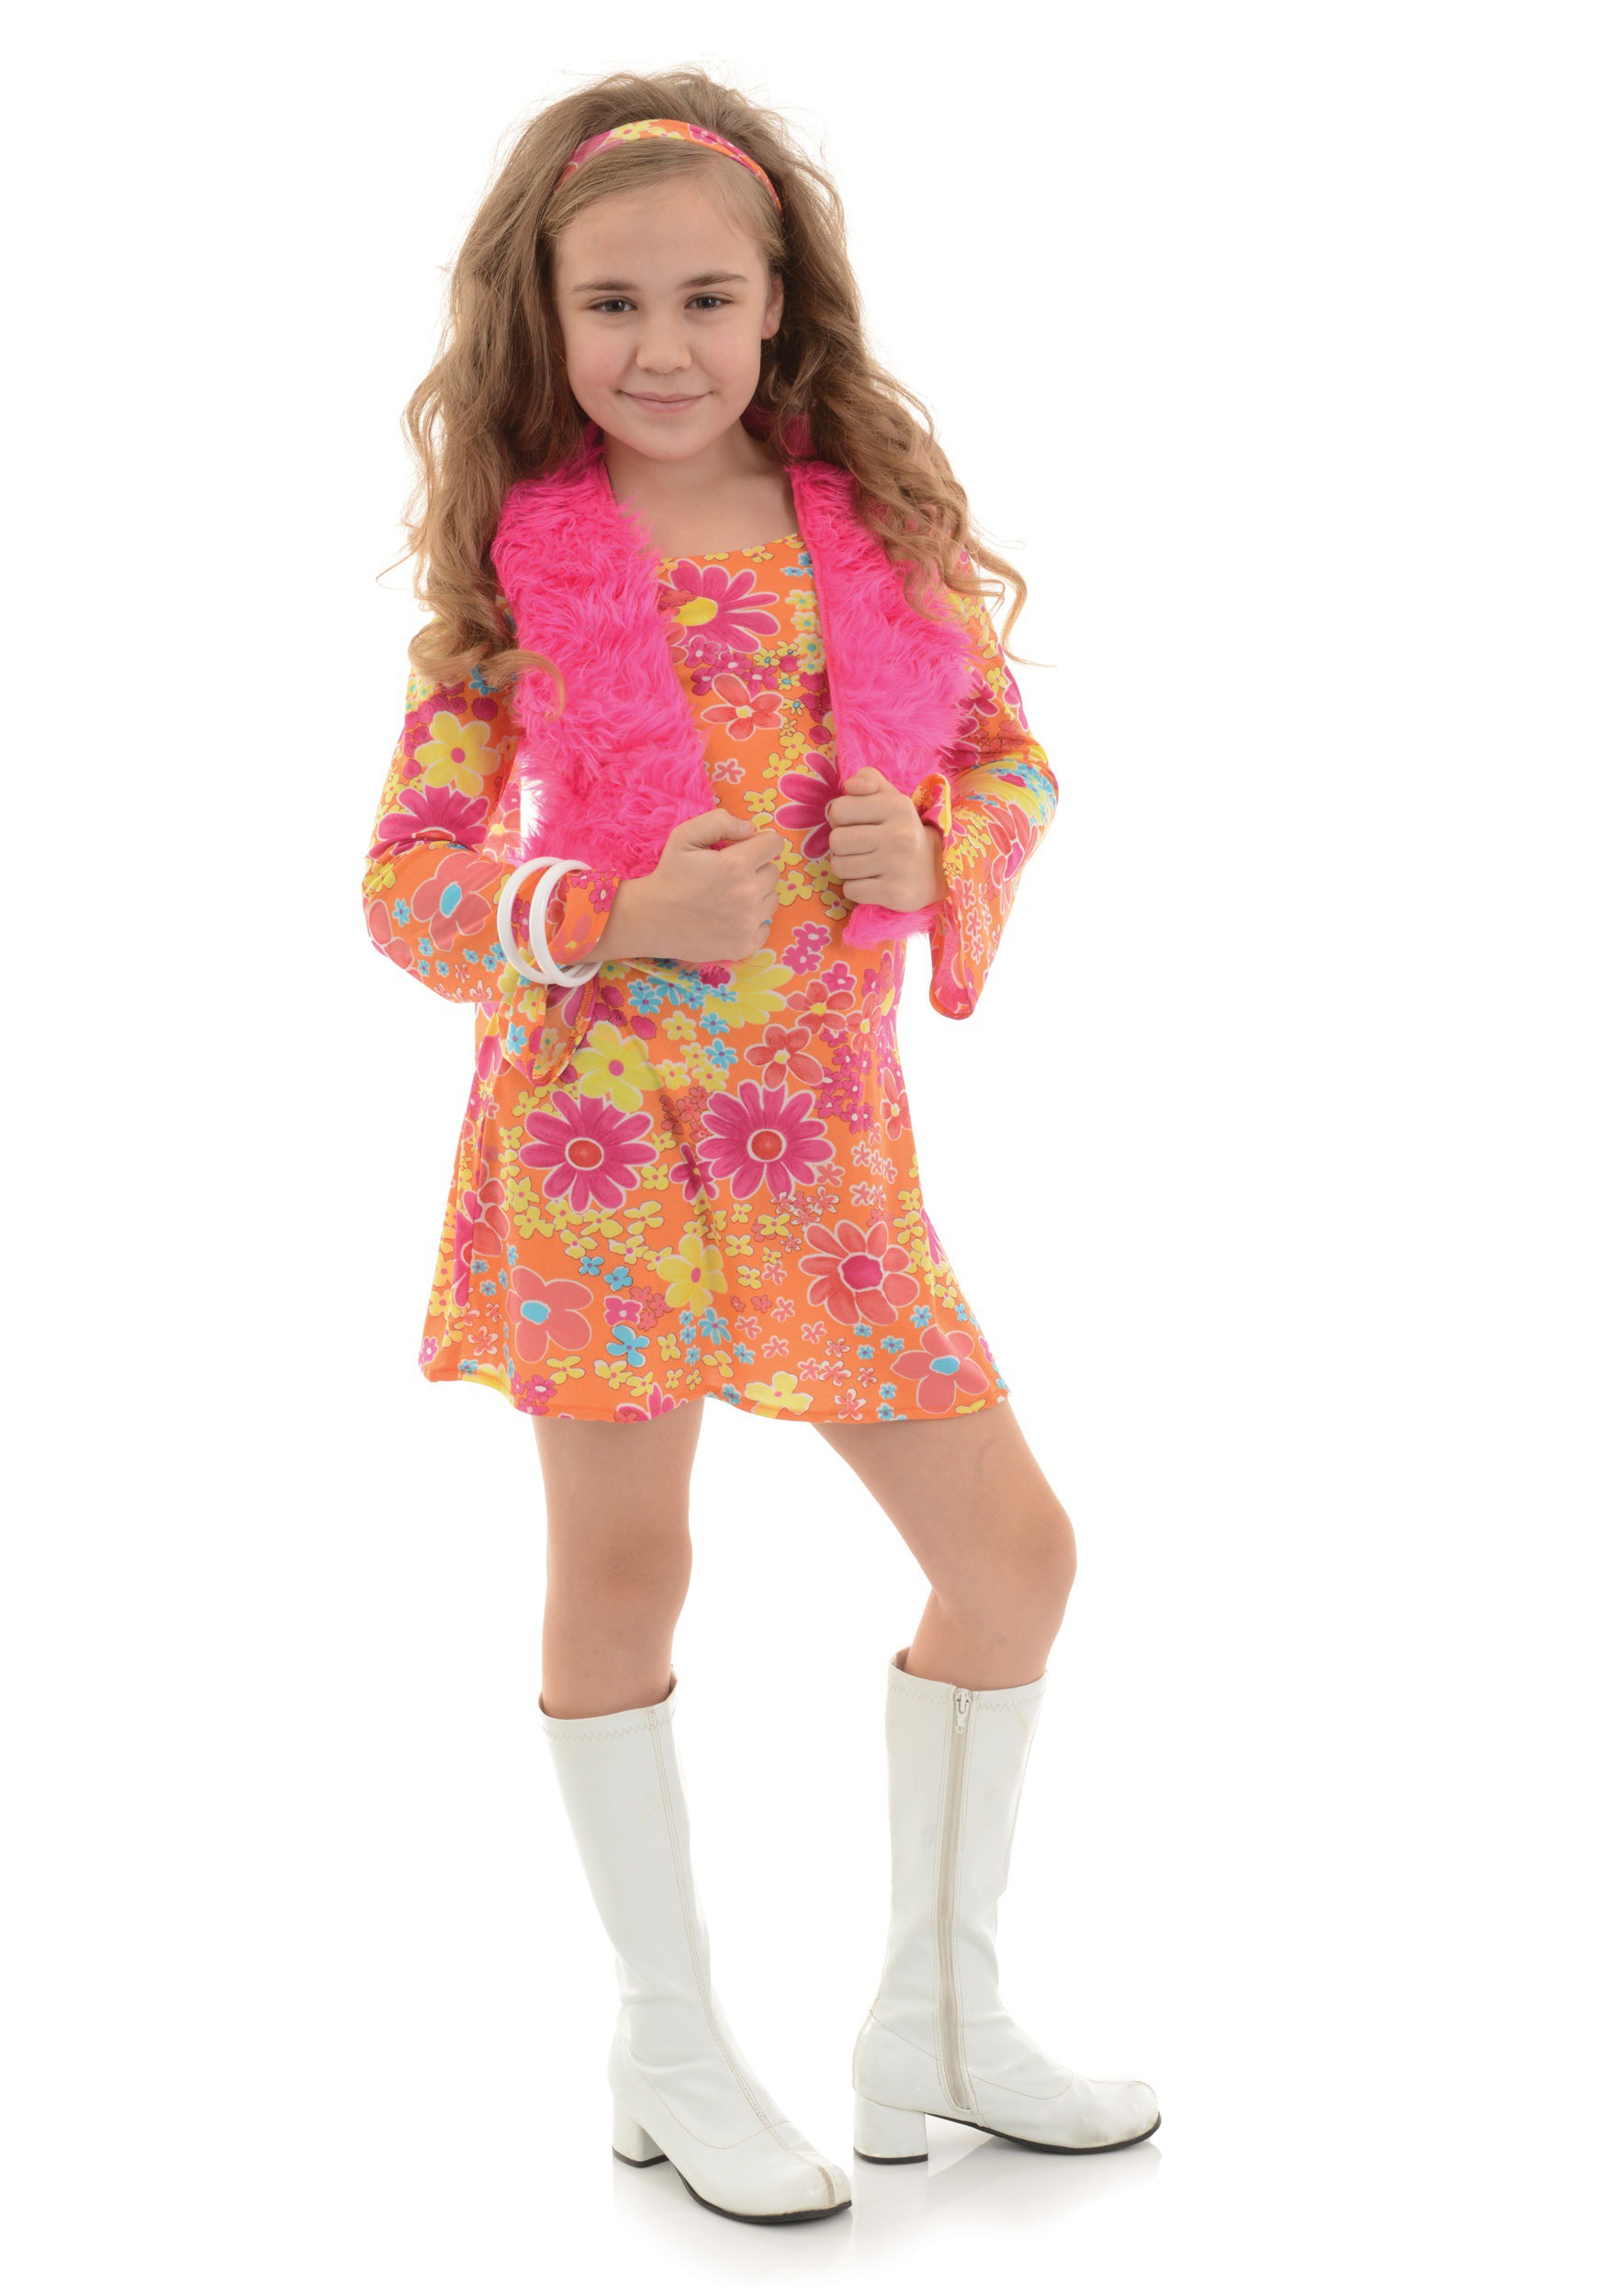 Soul Flower Clothing